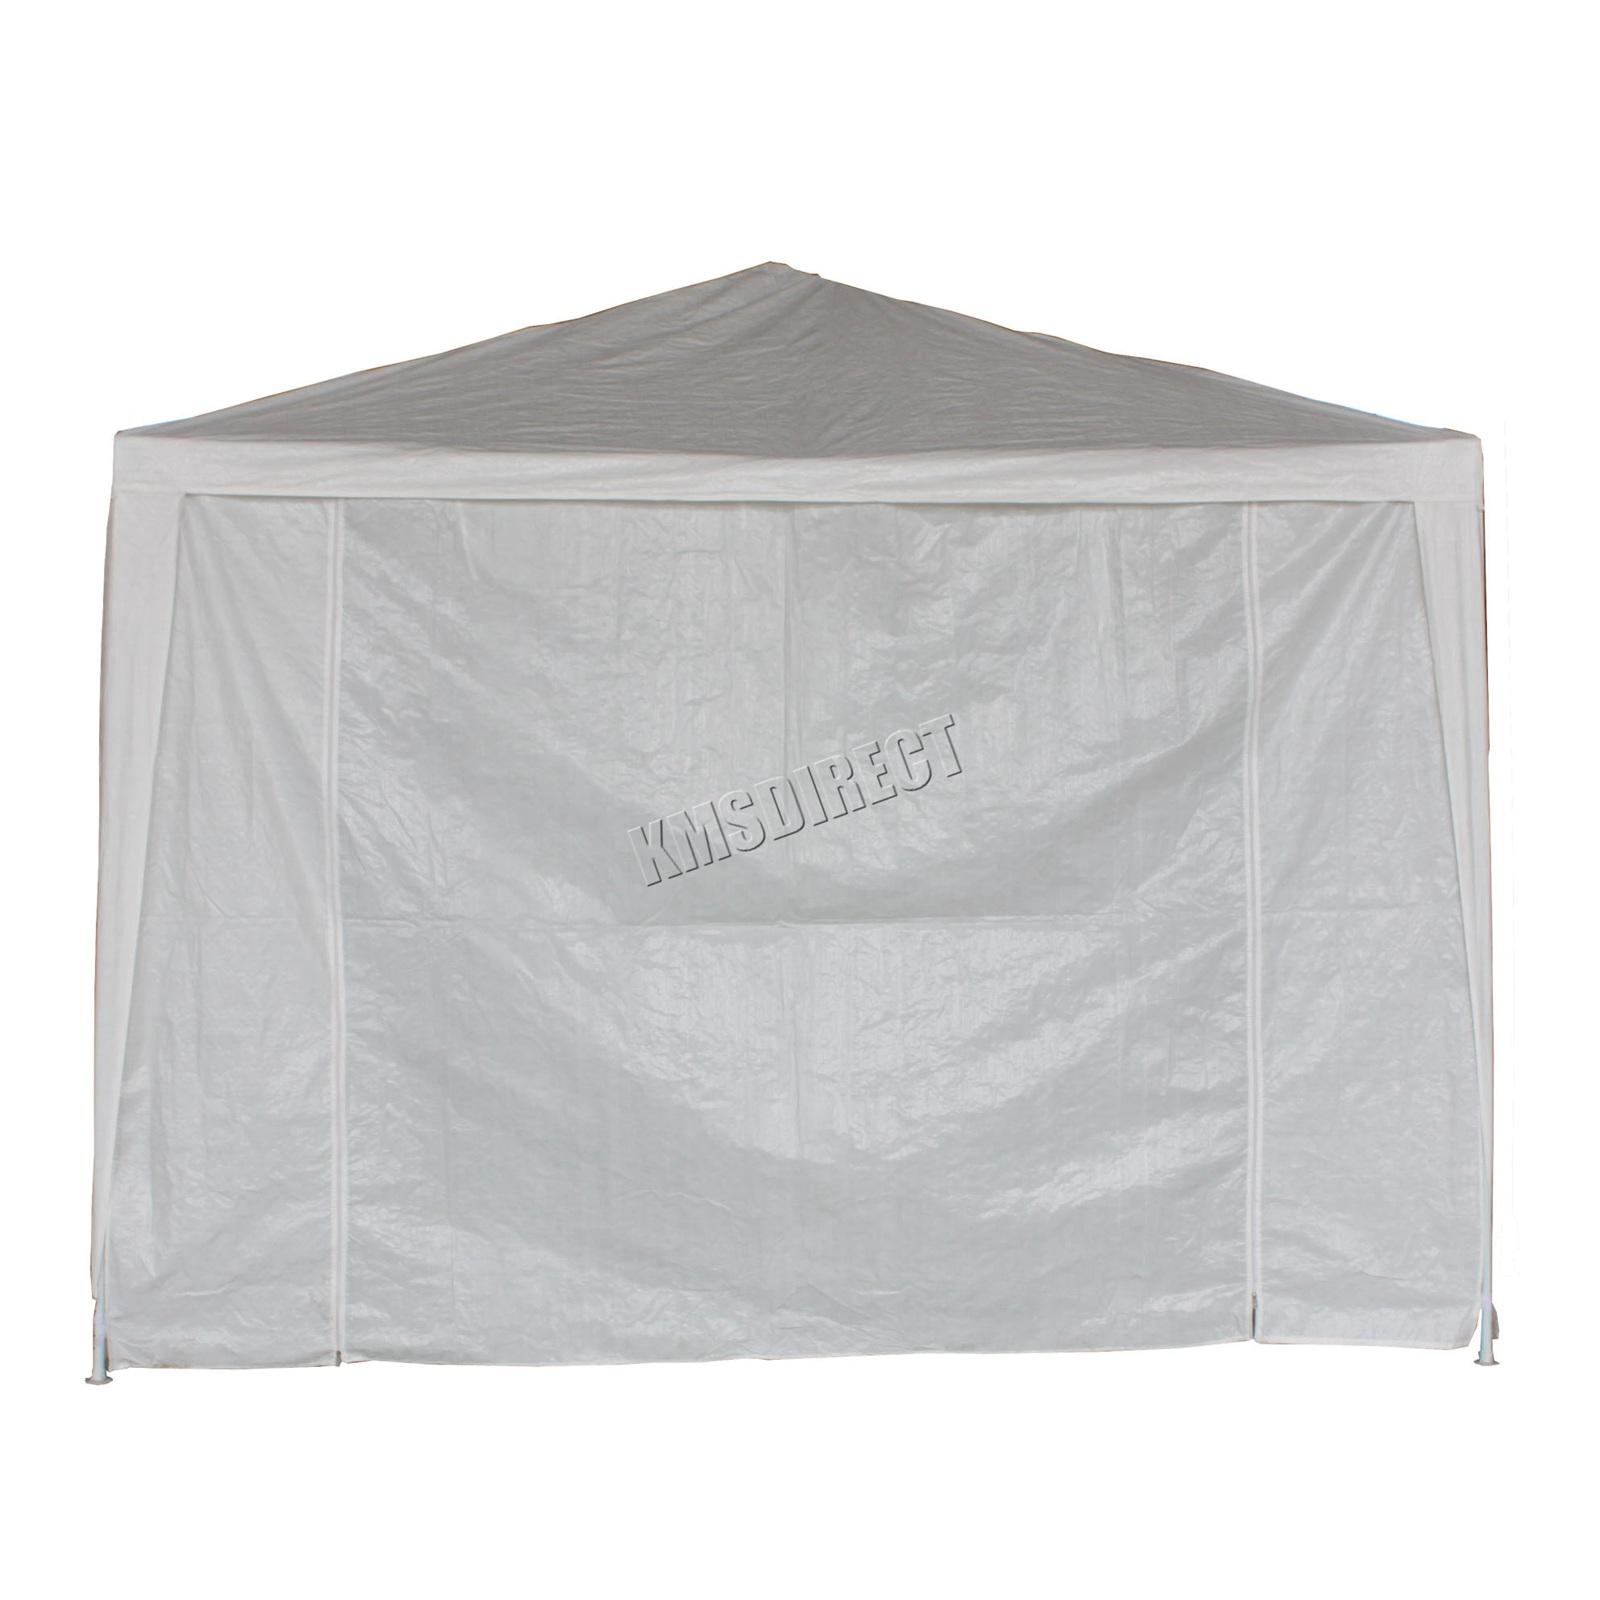 New-3-x-3m-120g-Waterproof-Outdoor-PE-Garden-Gazebo-Marquee-Canopy-Party-Tent Indexbild 31